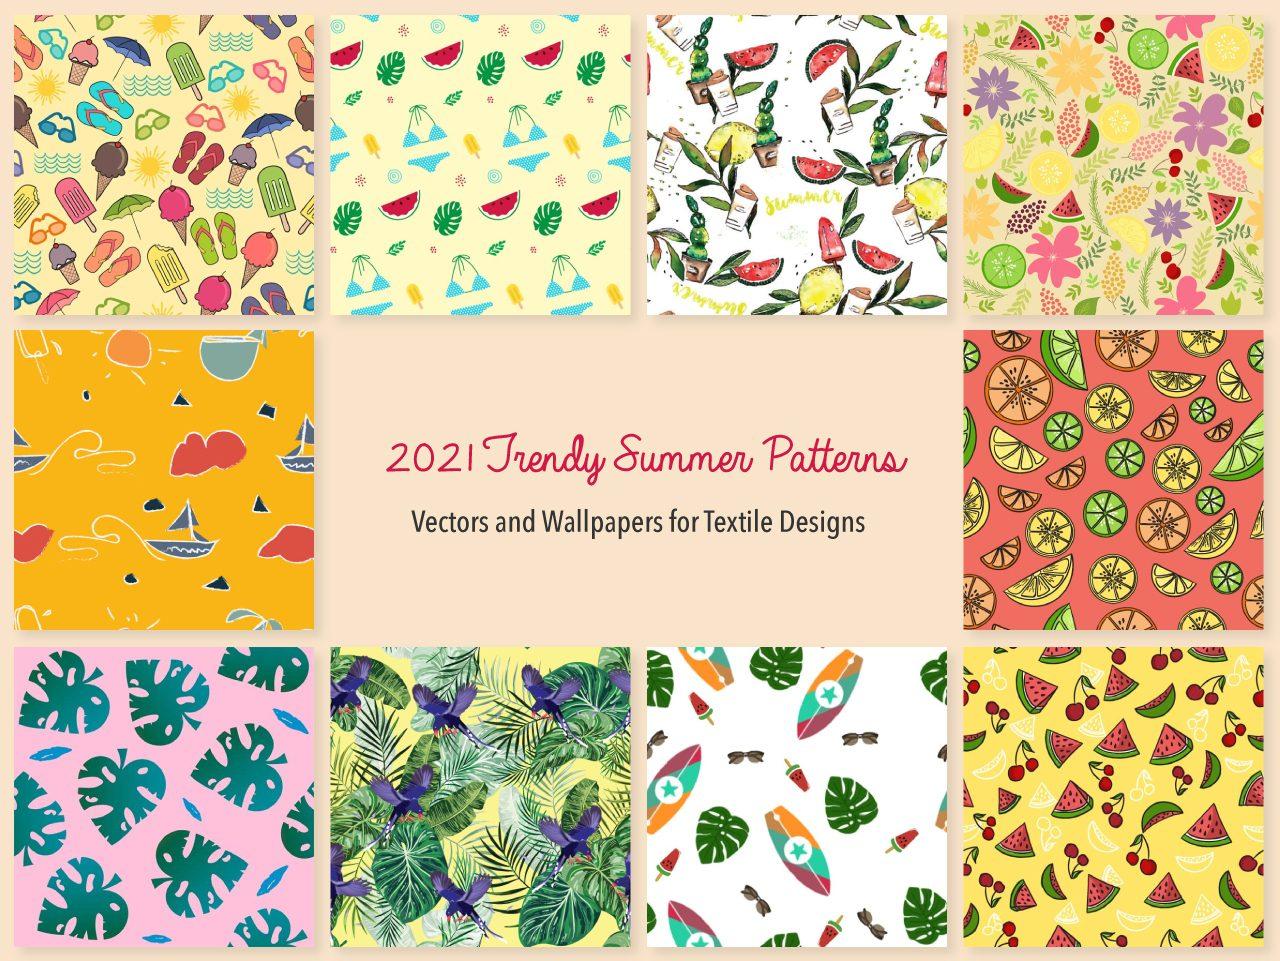 2021 Trendy Summer Vector Design Patterns Wallpapers   WowPatterns 1280x961